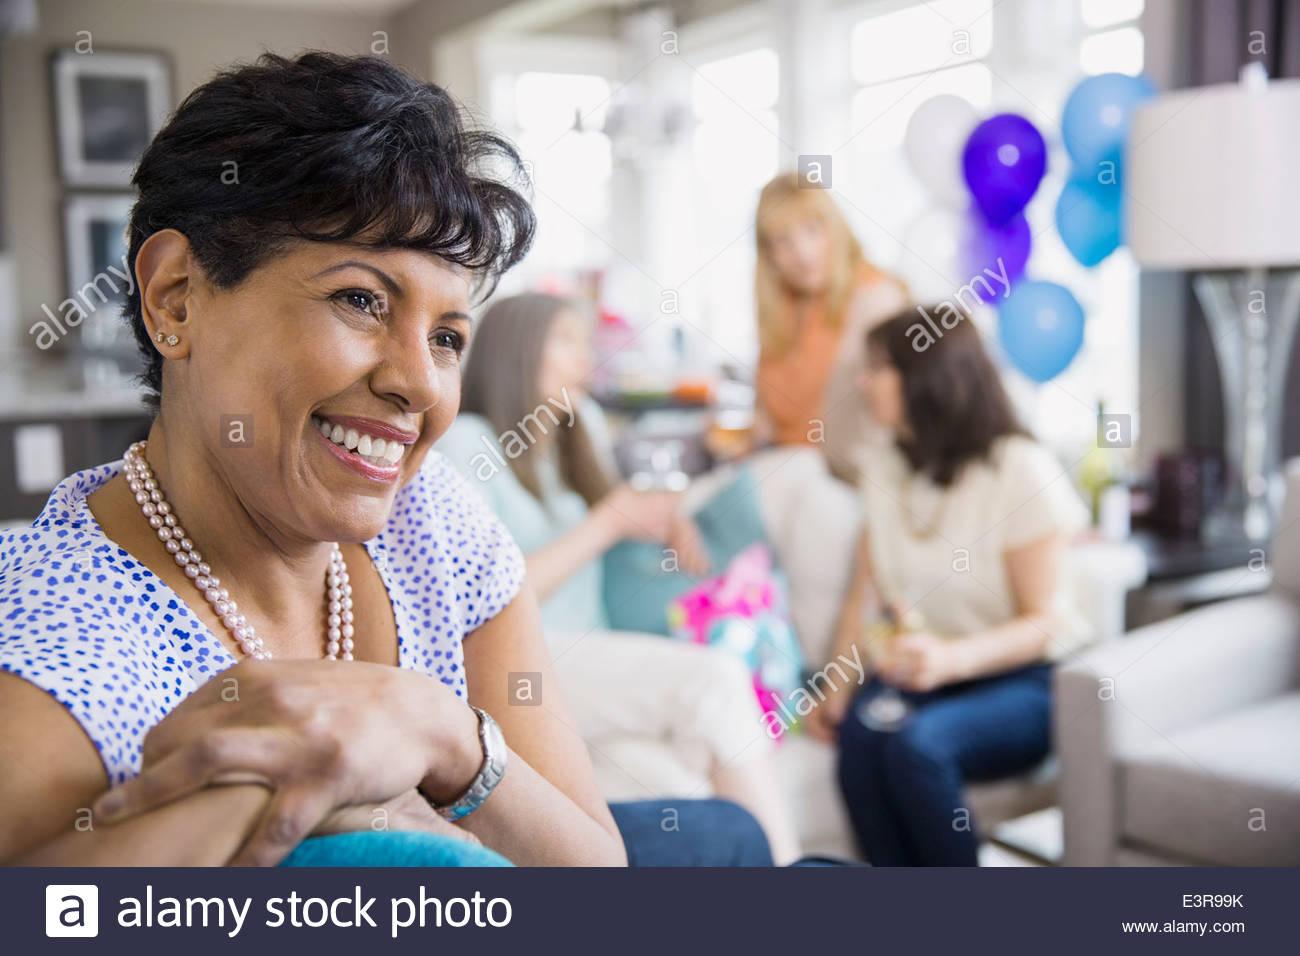 Smiling woman enjoying birthday party - Stock Image